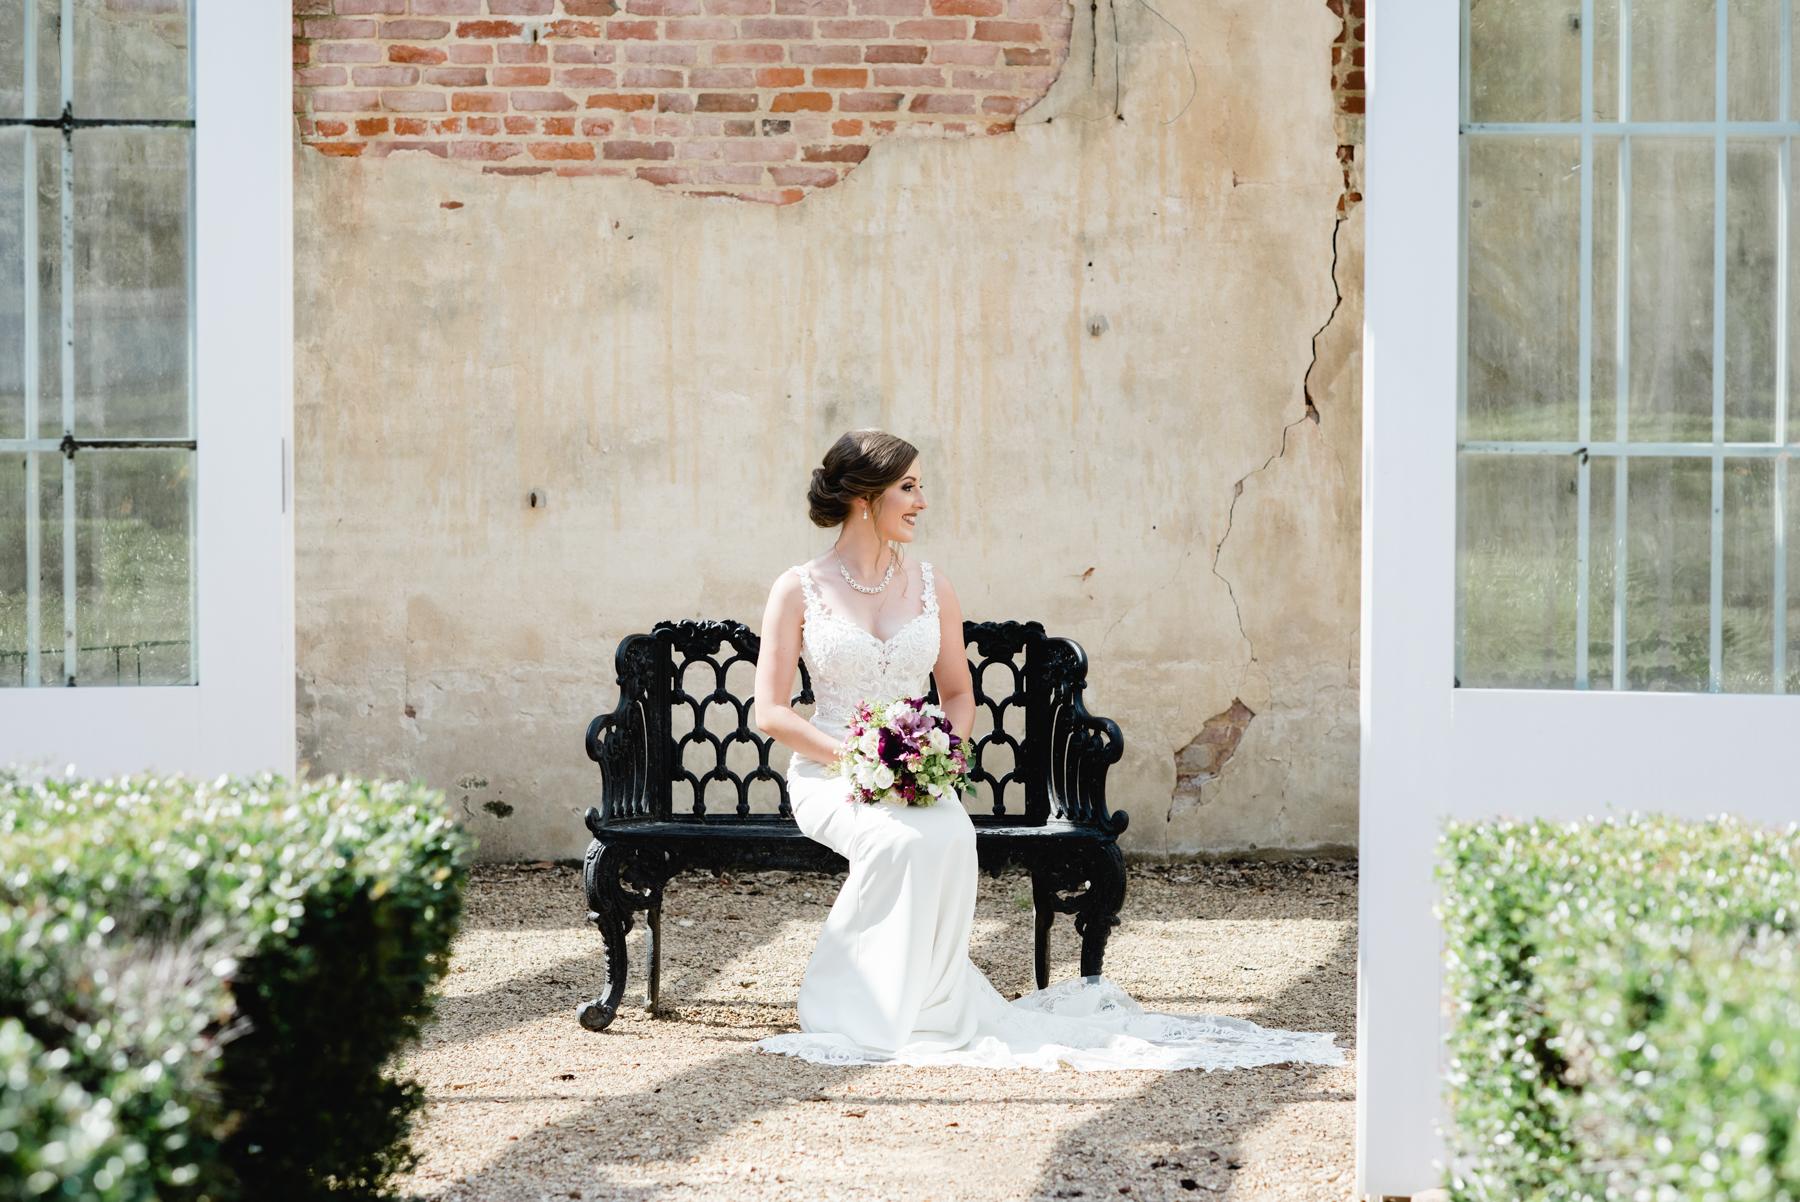 baton-rouge-wedding-photographer-7725.jpg